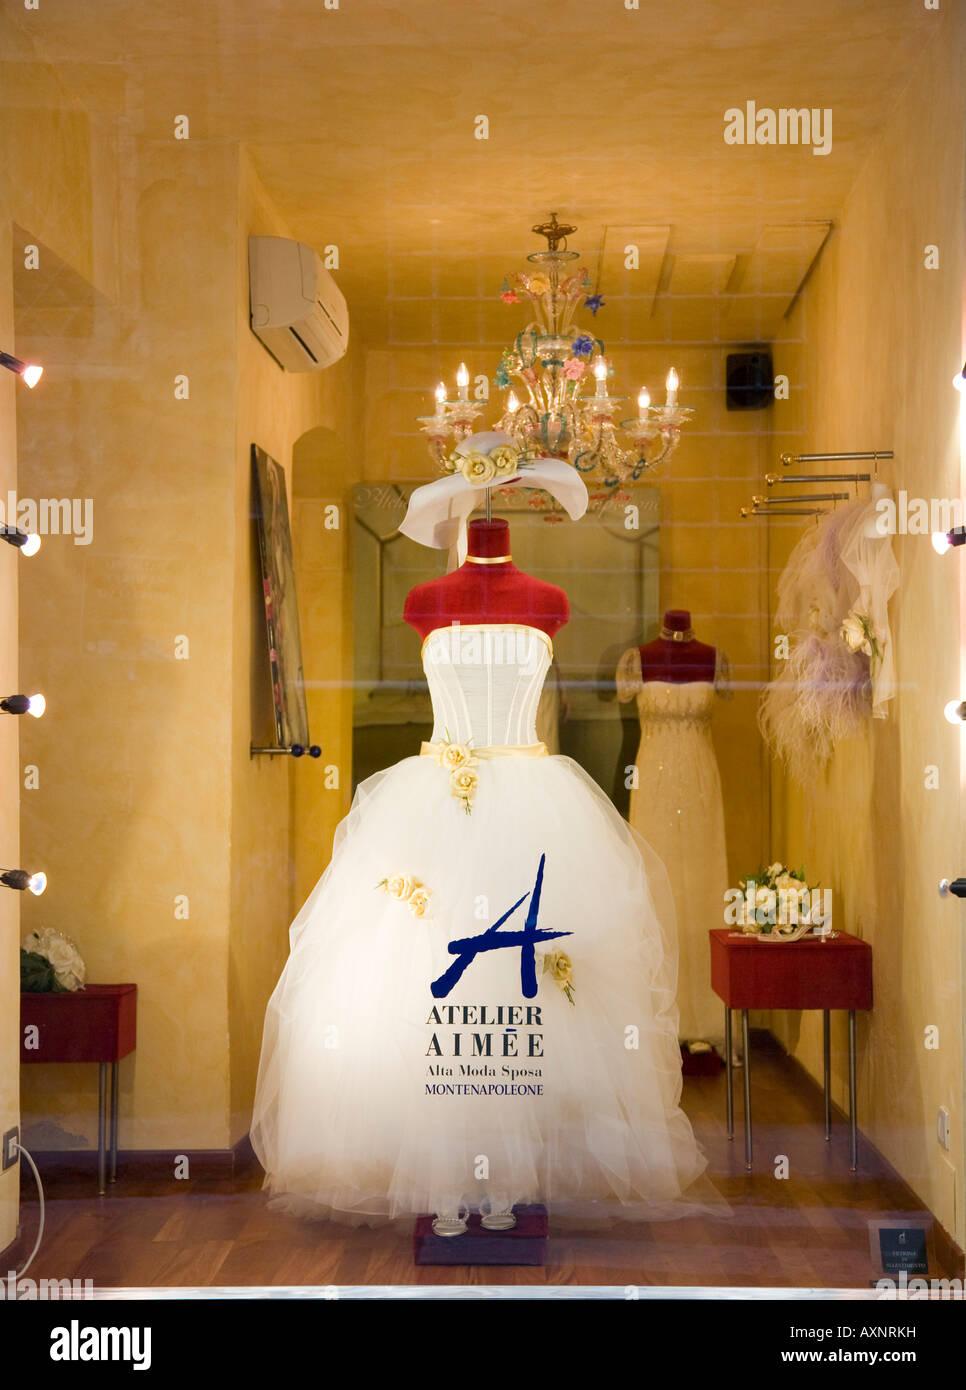 Wedding Dress In Shop Window Stock Photos & Wedding Dress In Shop ...